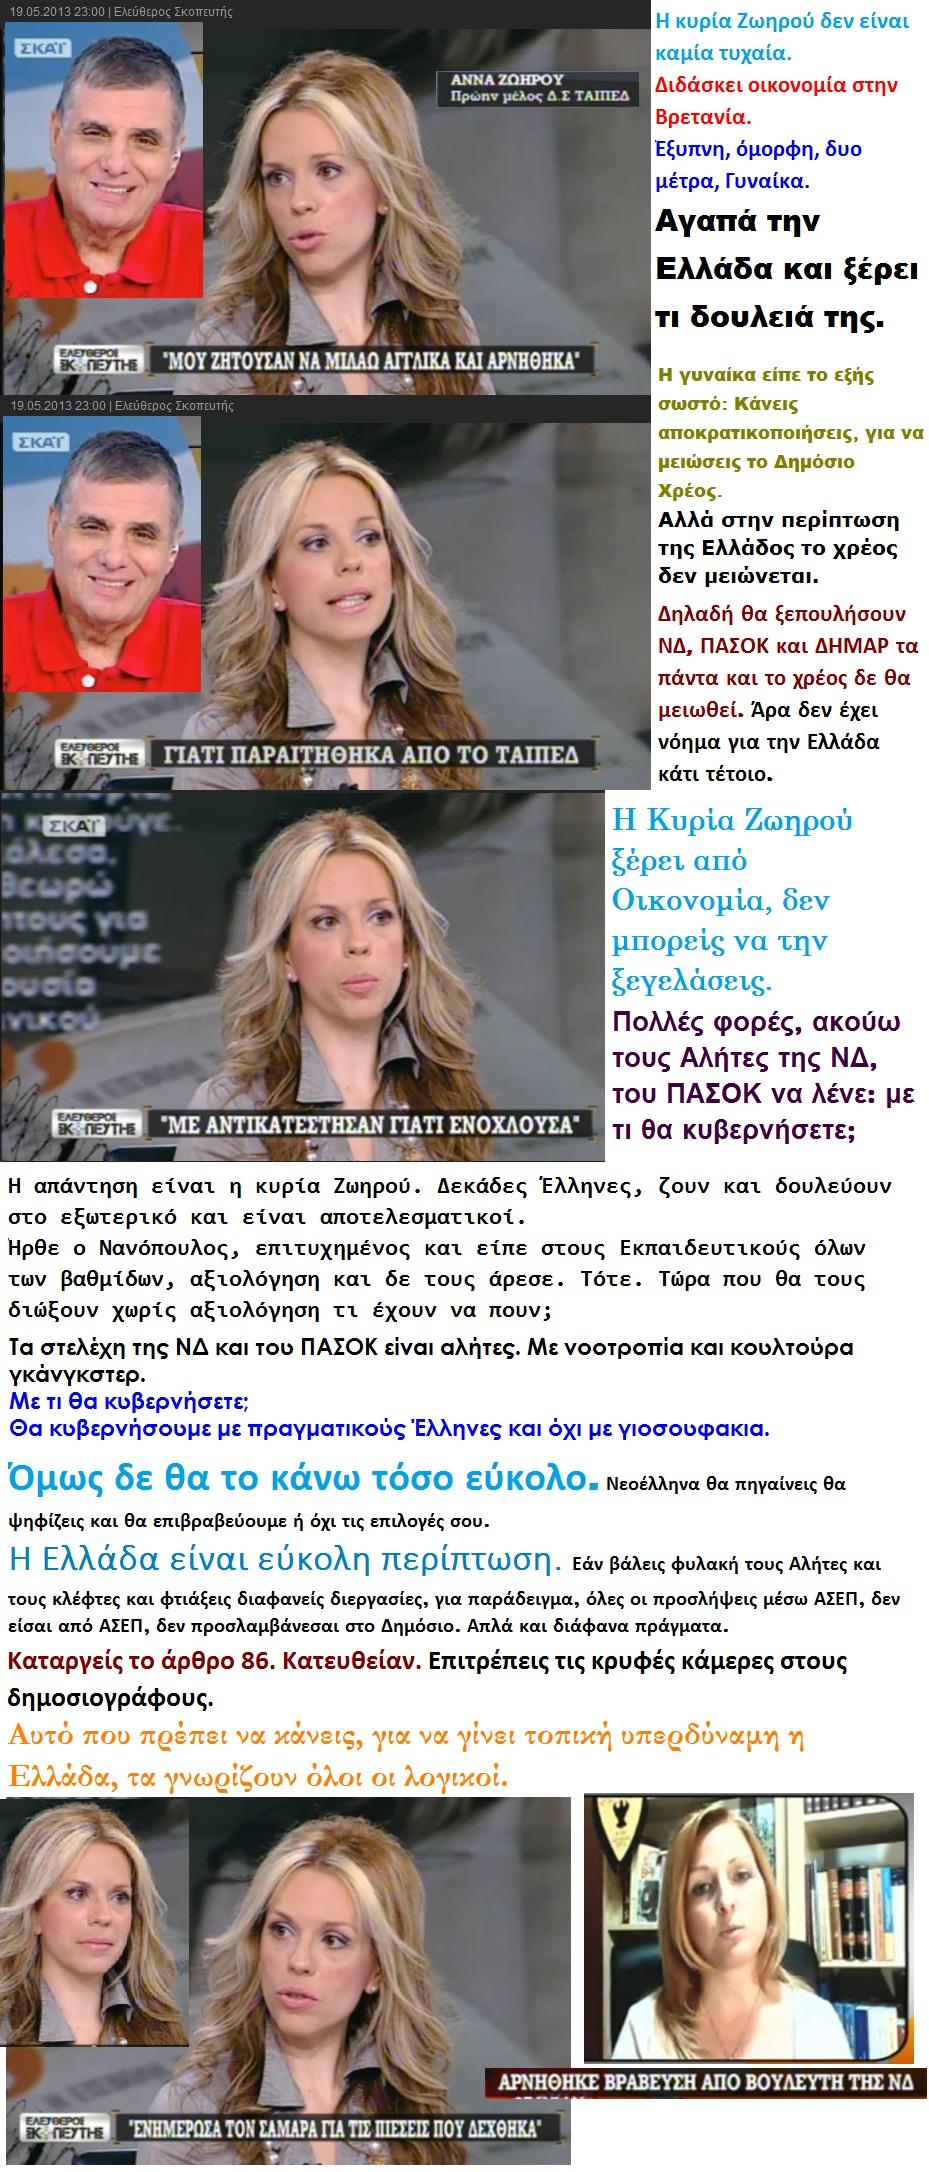 ELLADA ANNA ZOHROU TAIPED 01 01 20 190513